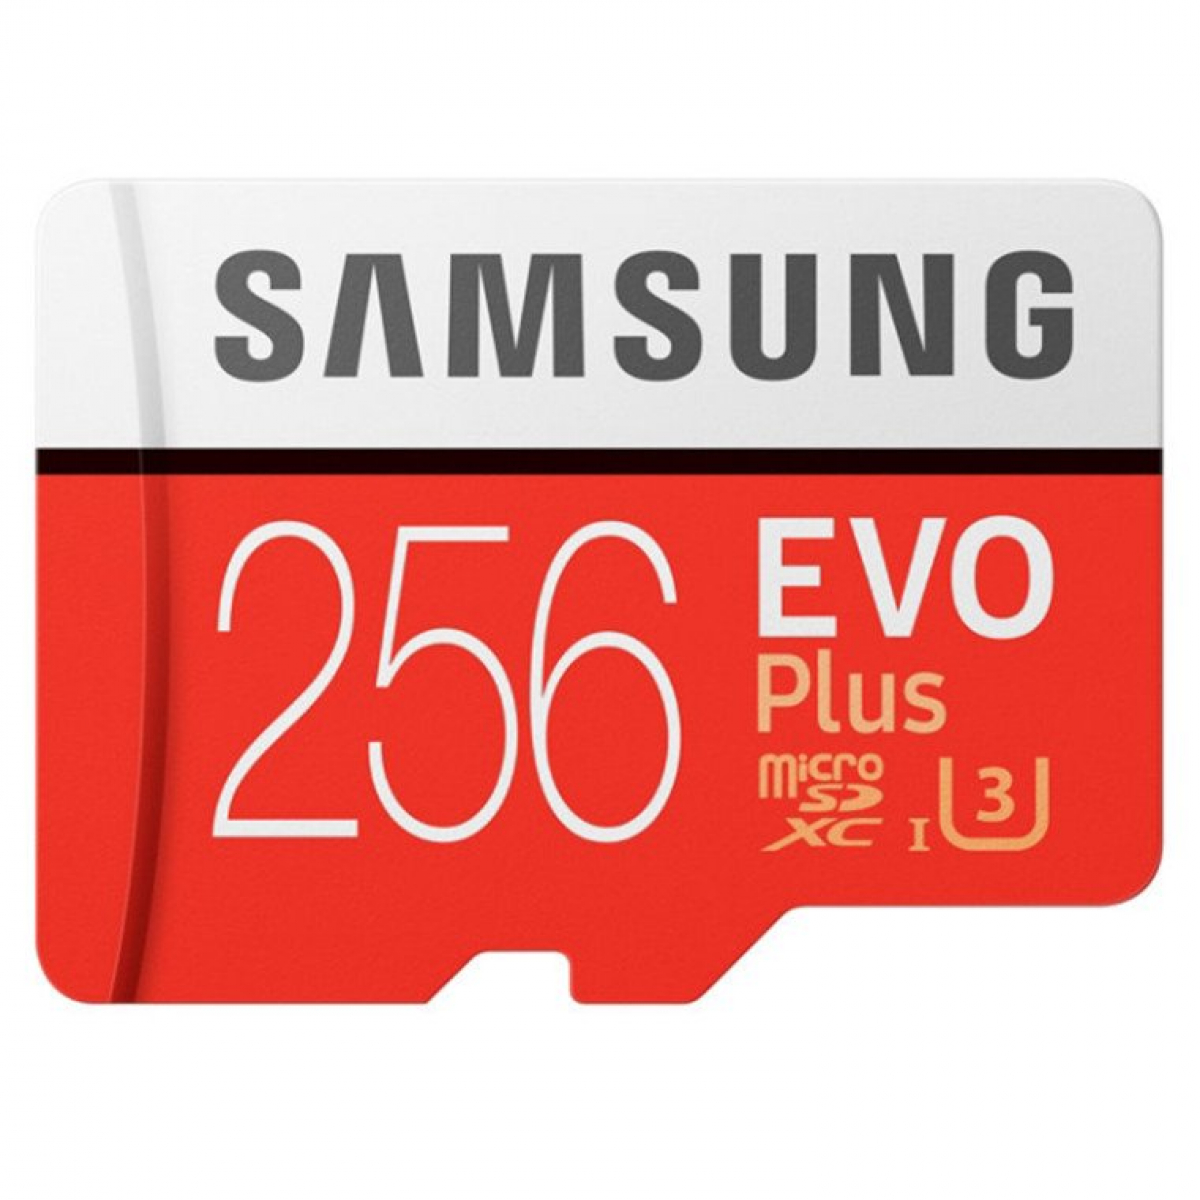 Samsung 256GB EVO PLUS MICRO SD W ADAPTER